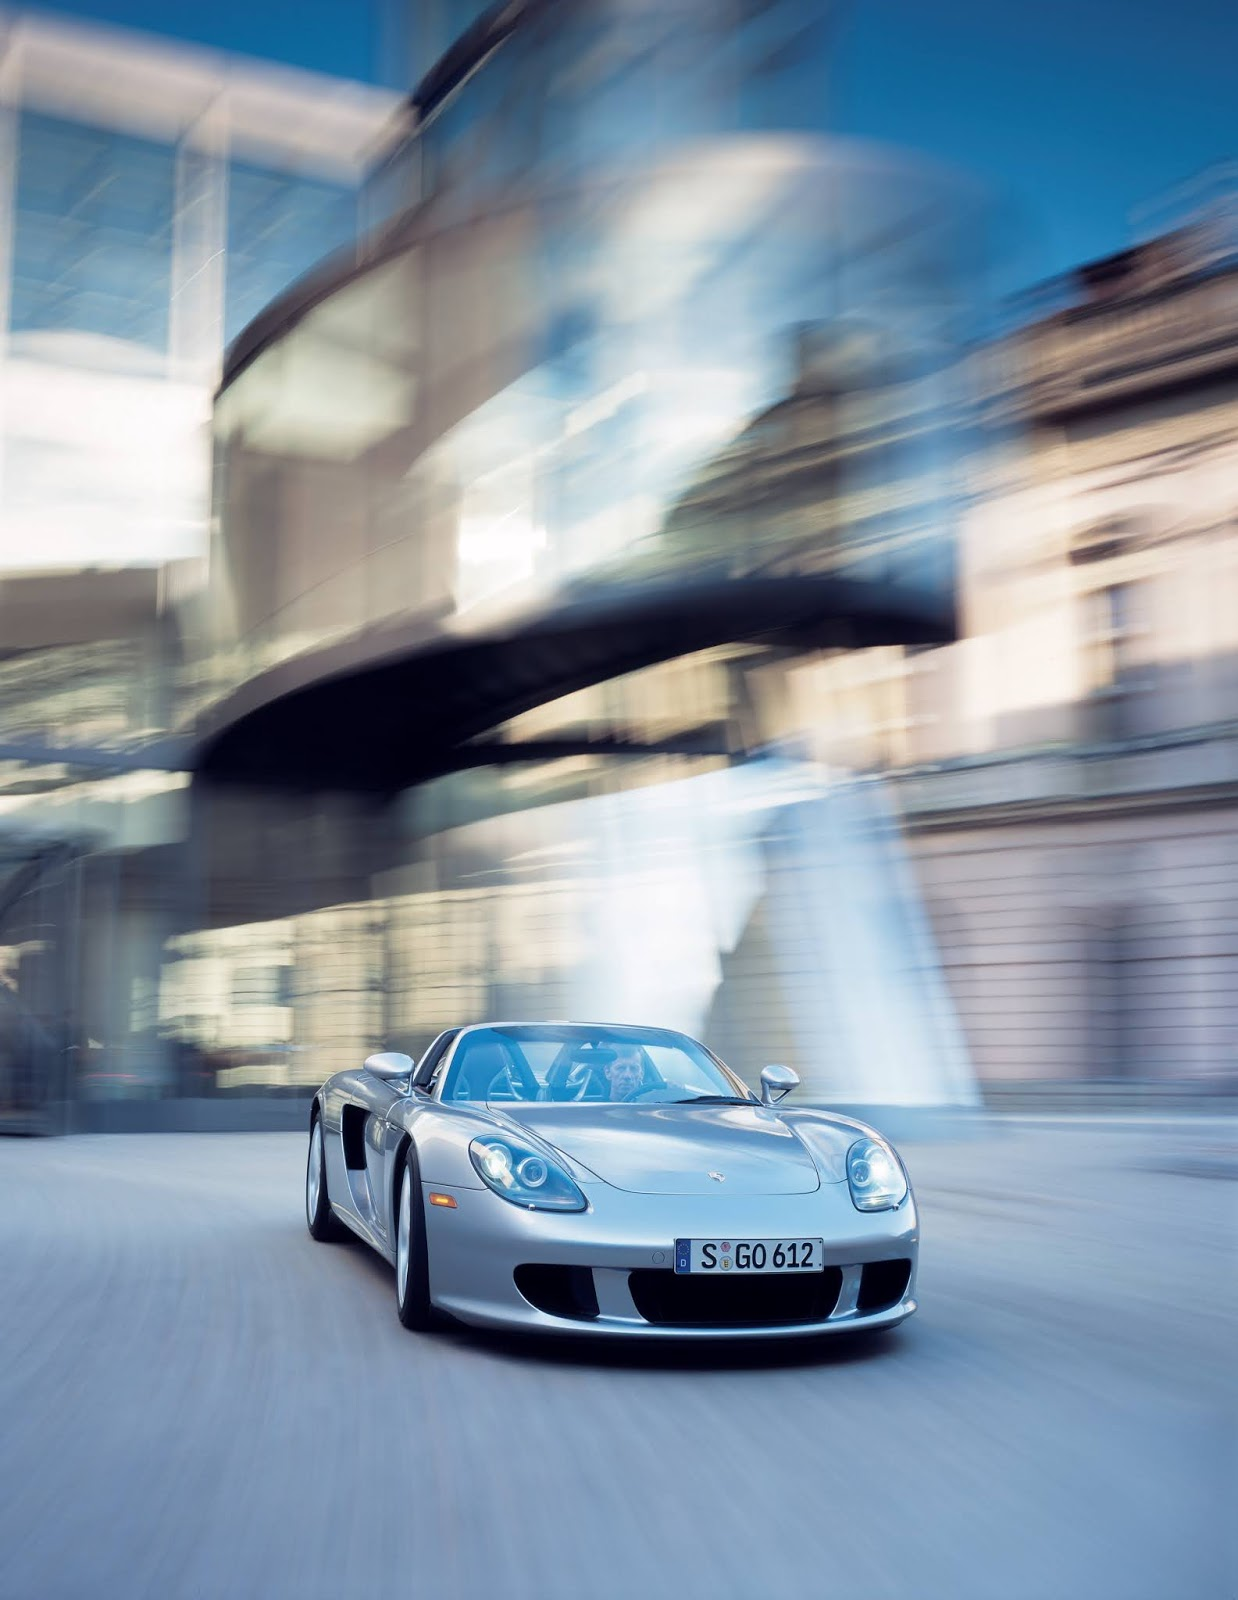 P03 1160 a4 Porsche Carrera GT : Ένα αγωνιστικό LeMans, για το δρόμο Carrera GT, Porsche, Porsche Carrera GT, retrocar, retrocar sunday, supercar, zblog